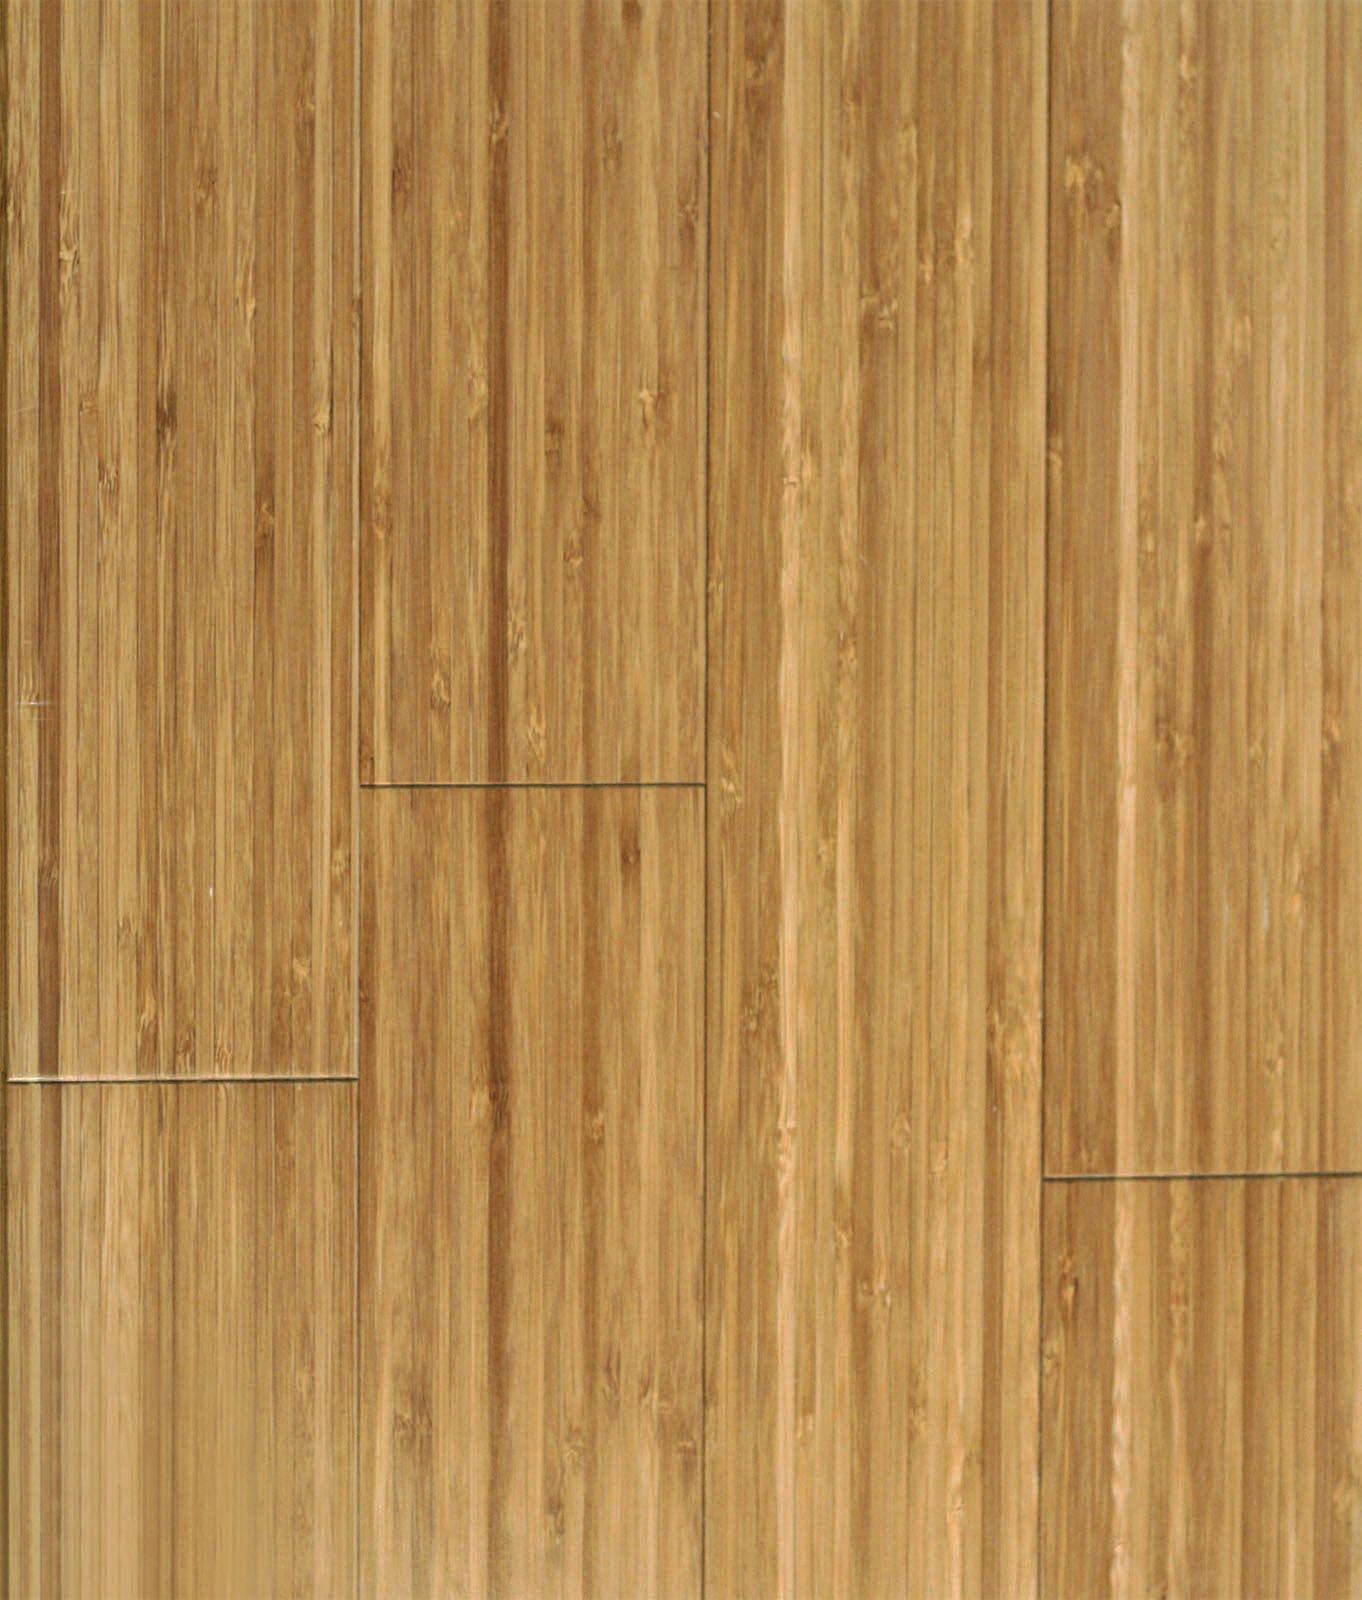 Bamboo Grove Photo Bamboo Hardwood Floors